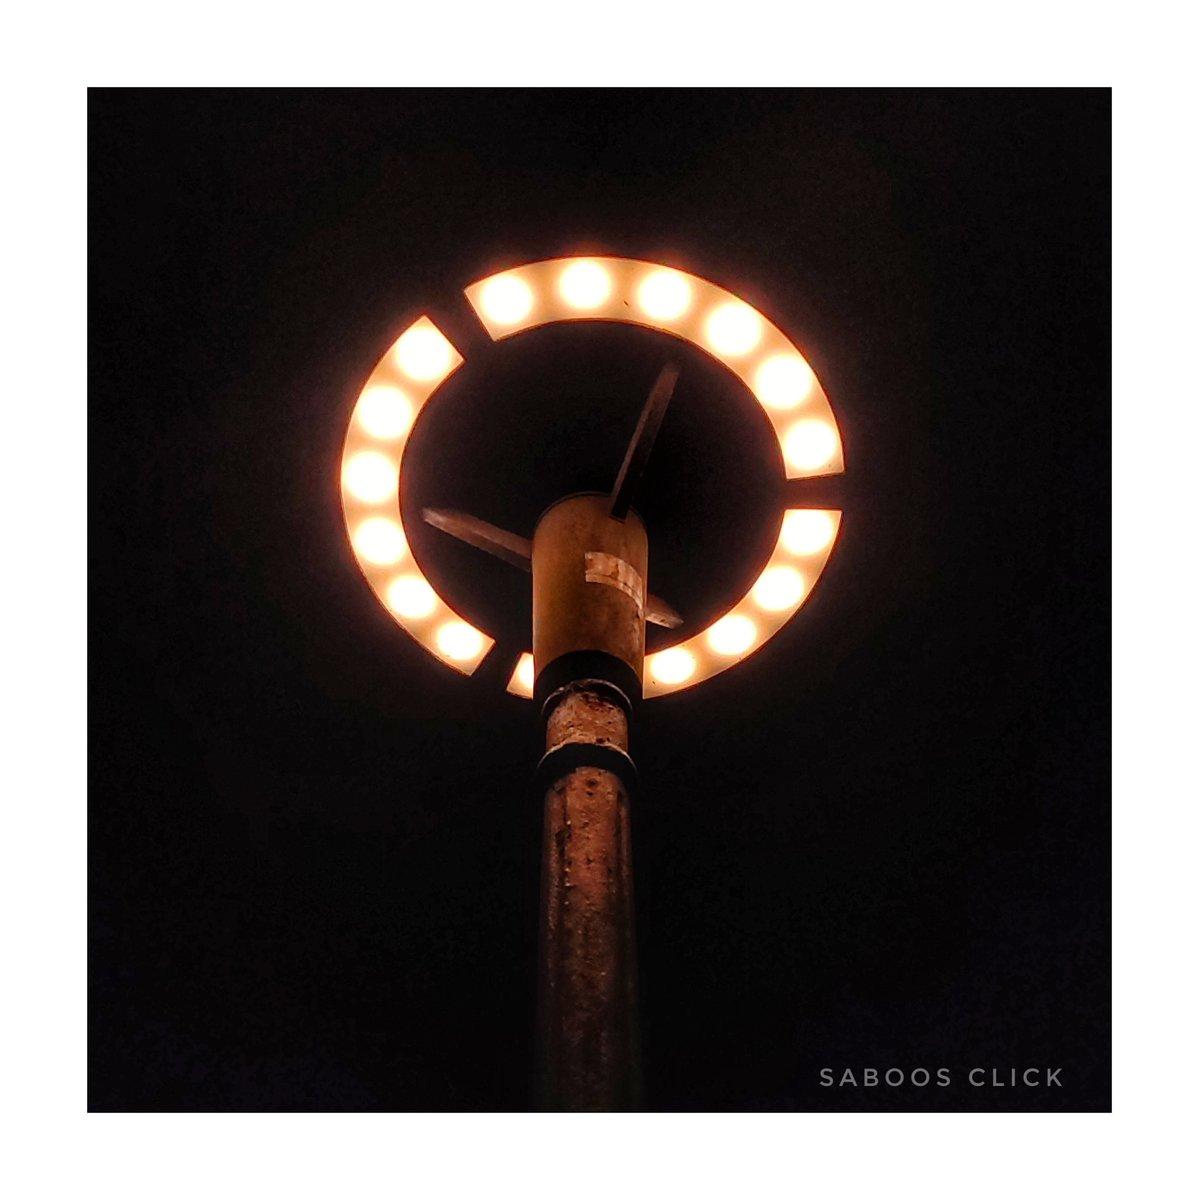 Good Night #night #darkness #LED #Kerala #Mobile #mobilephotography #Redmi #myphoto #World #worldwide #NightView #nightshot #Kerala #keralatourism #muzriz #PhotographyIsArt